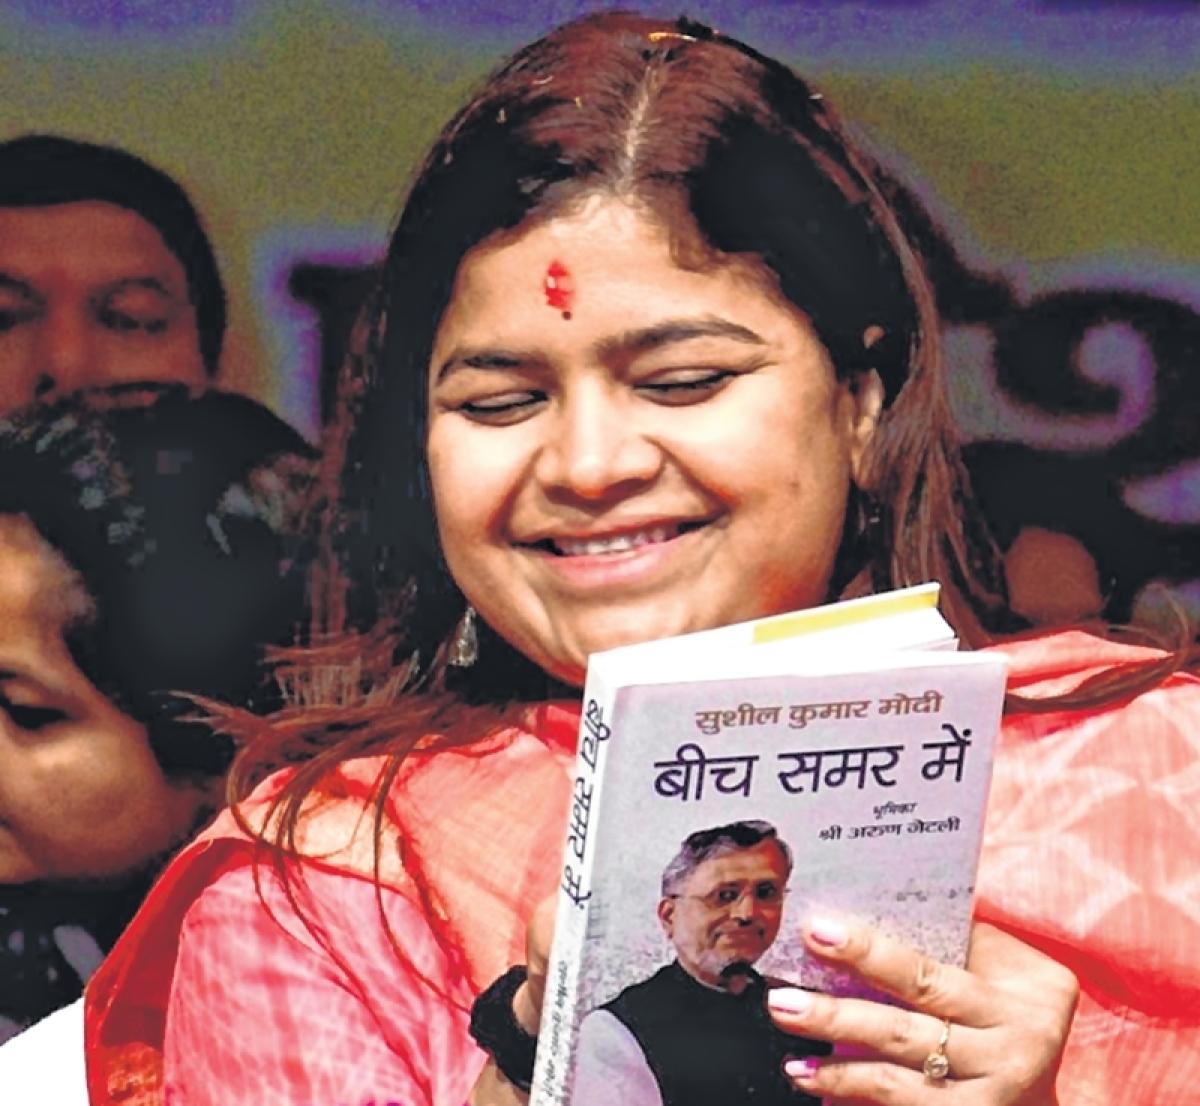 Lok Sabha elections 2019: When society works together, it inspires us all, says Poonam Mahajan